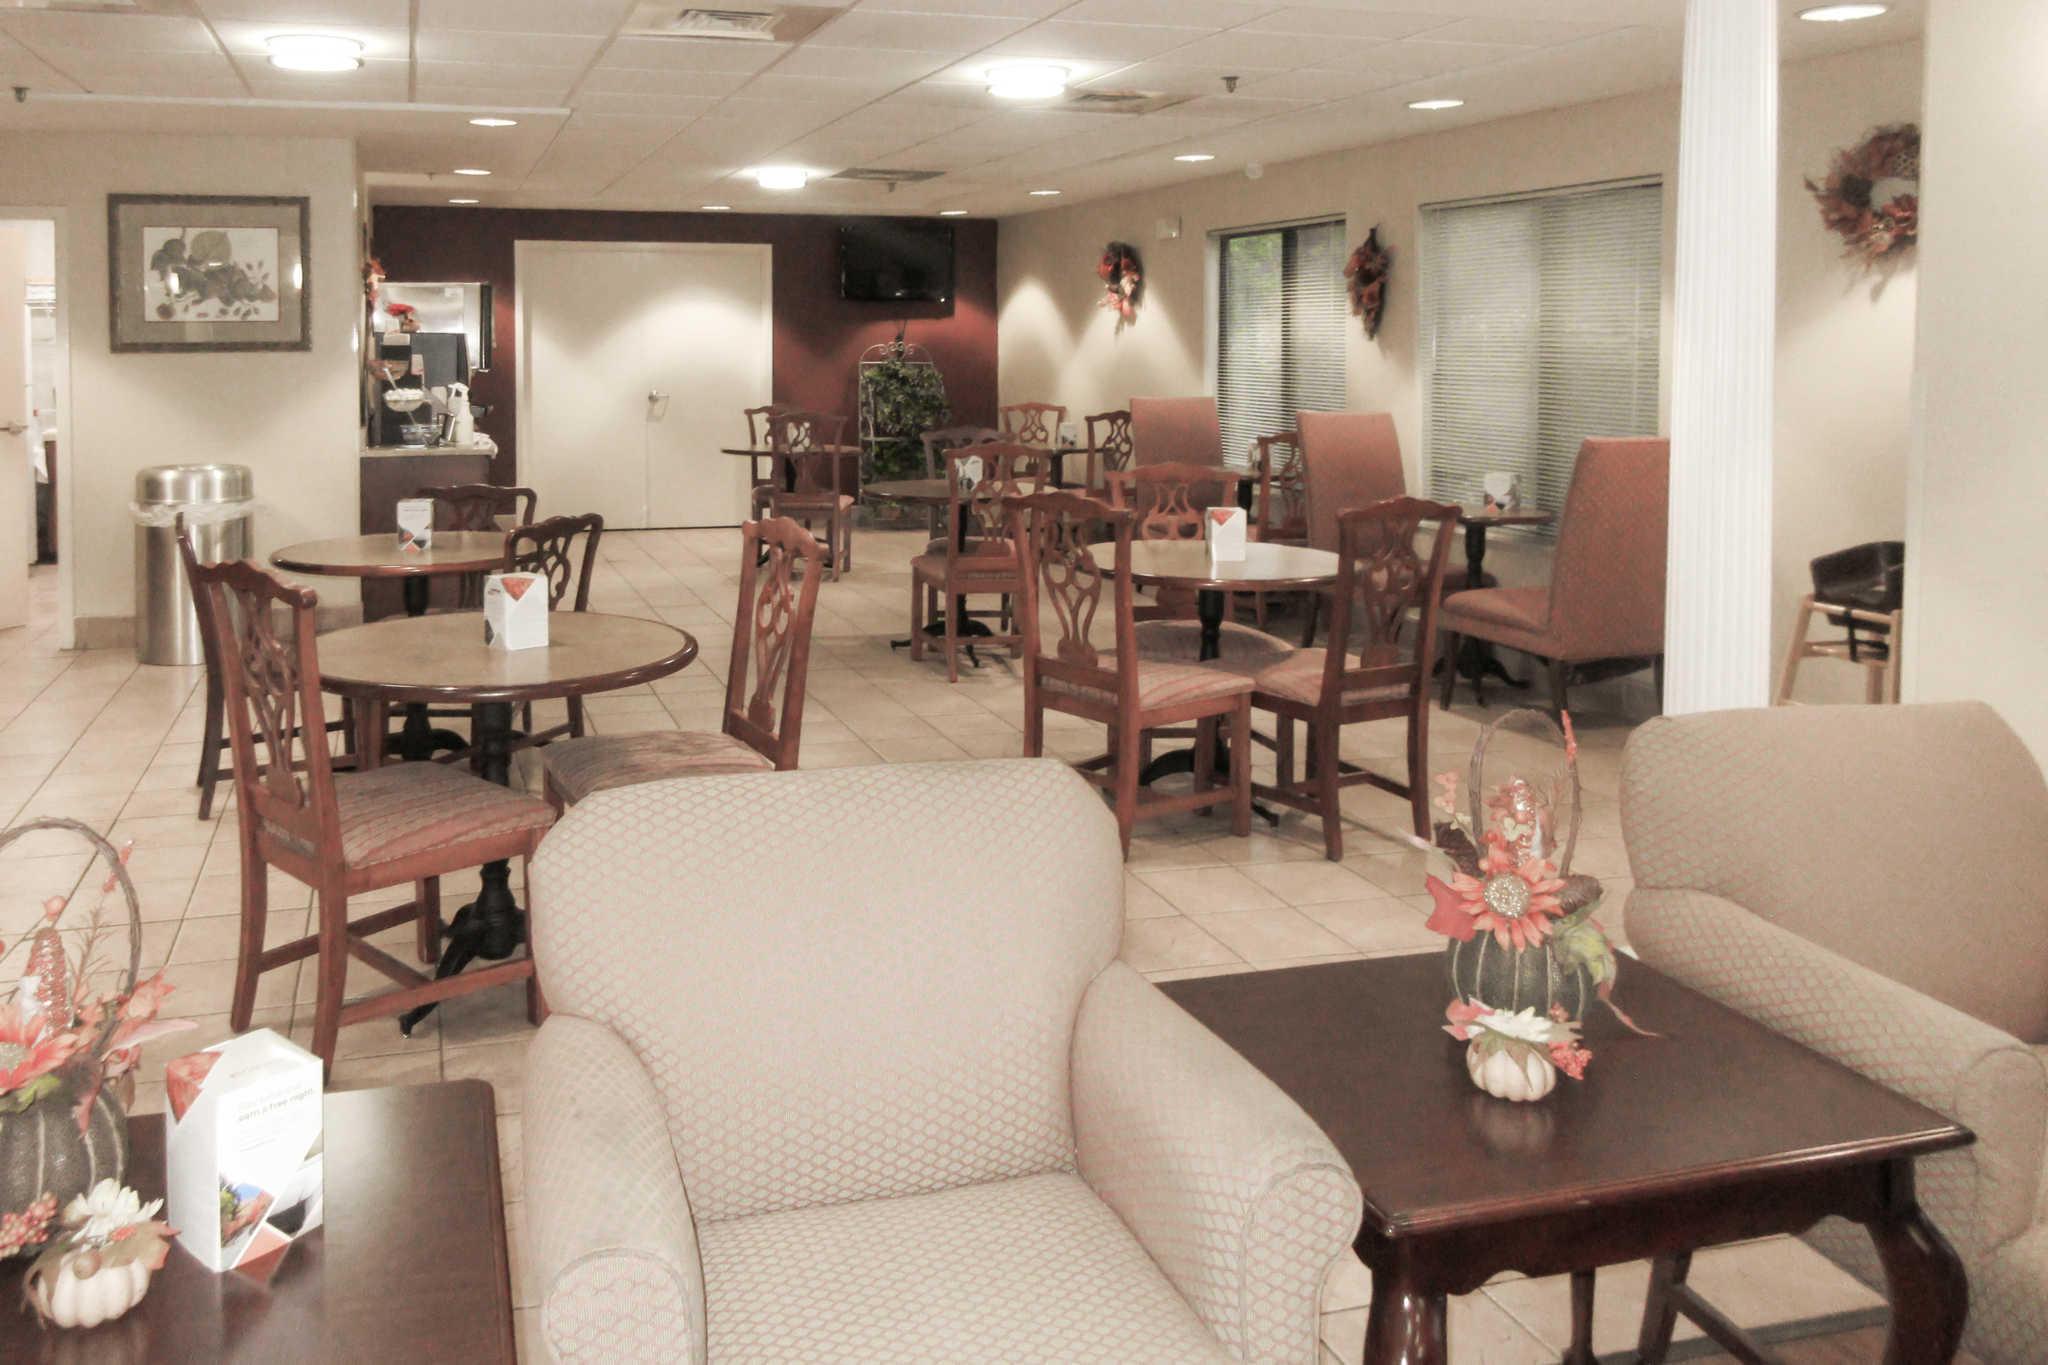 Rodeway Inn Troutville (540)992-5055